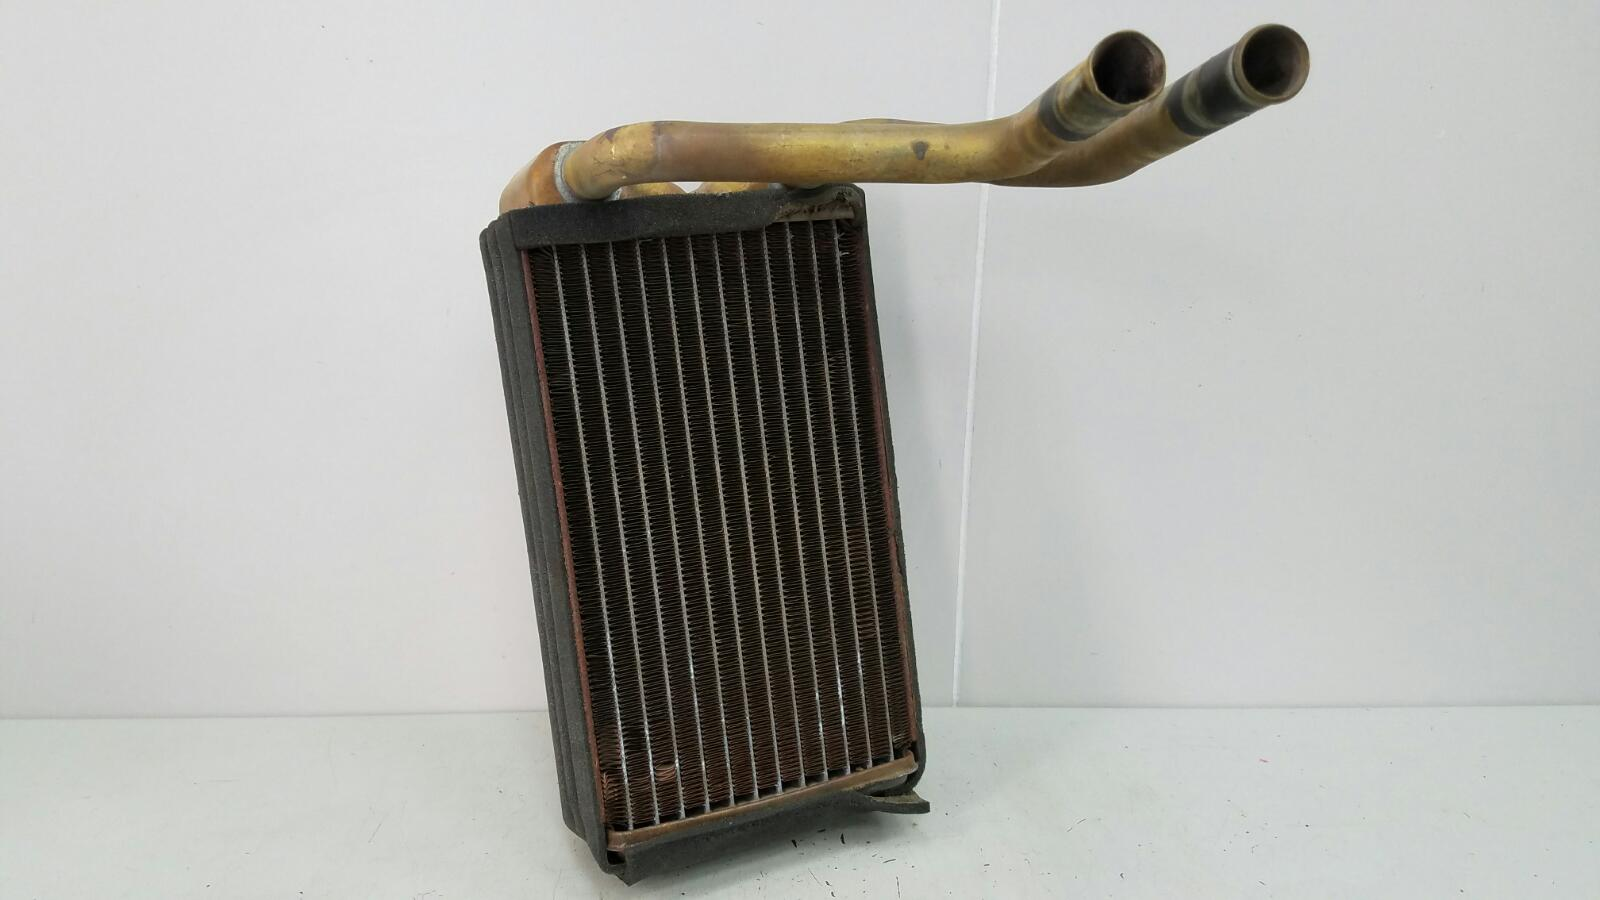 Радиатор печки Honda Civic Ferio EG8 D15B 1.6Л 1992